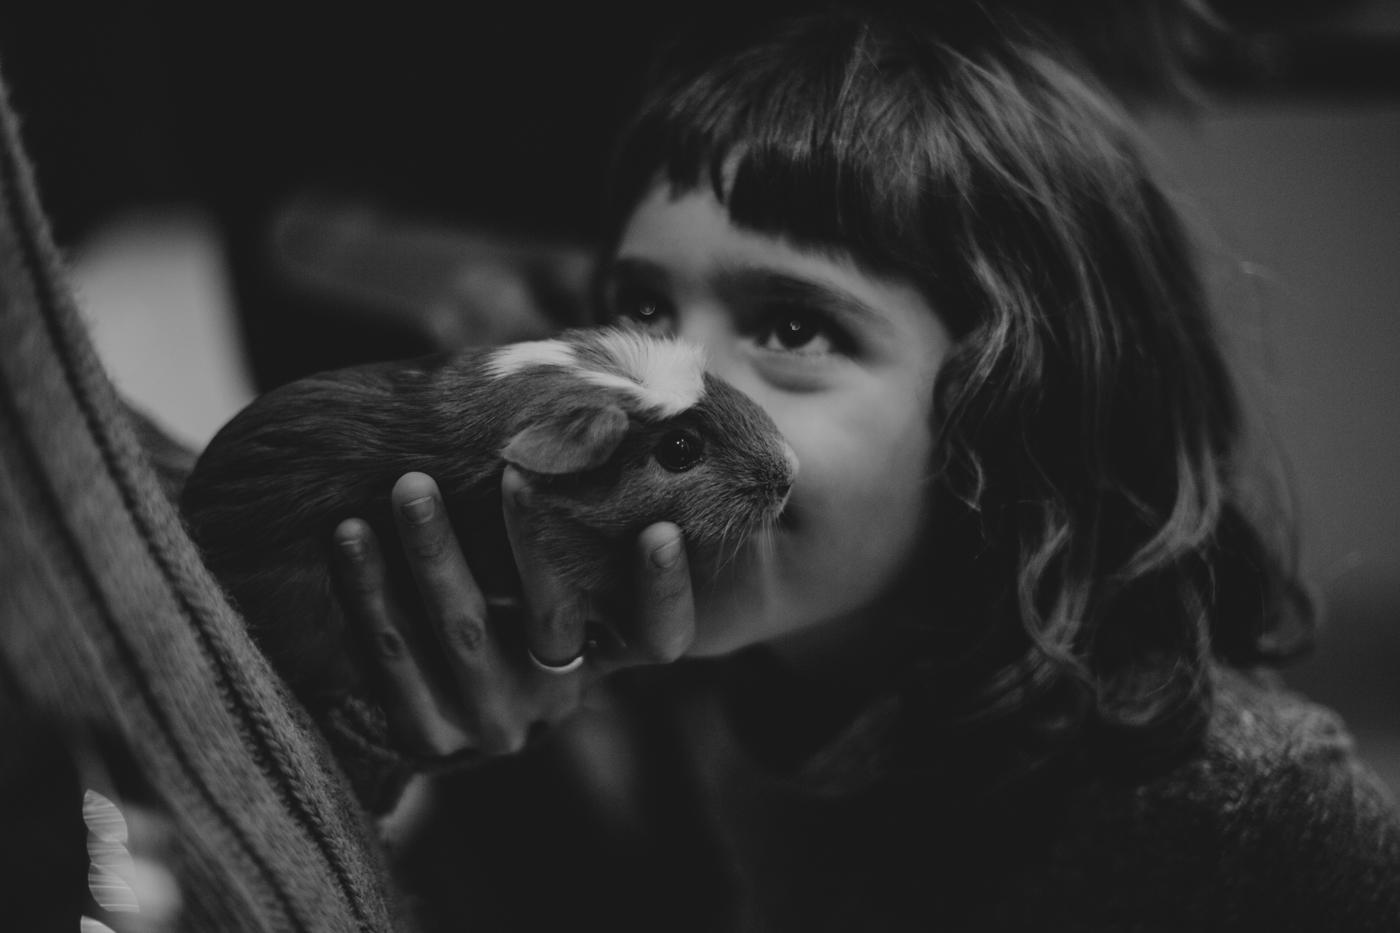 Velvet-Hush-fotografos-sesion-familia-010